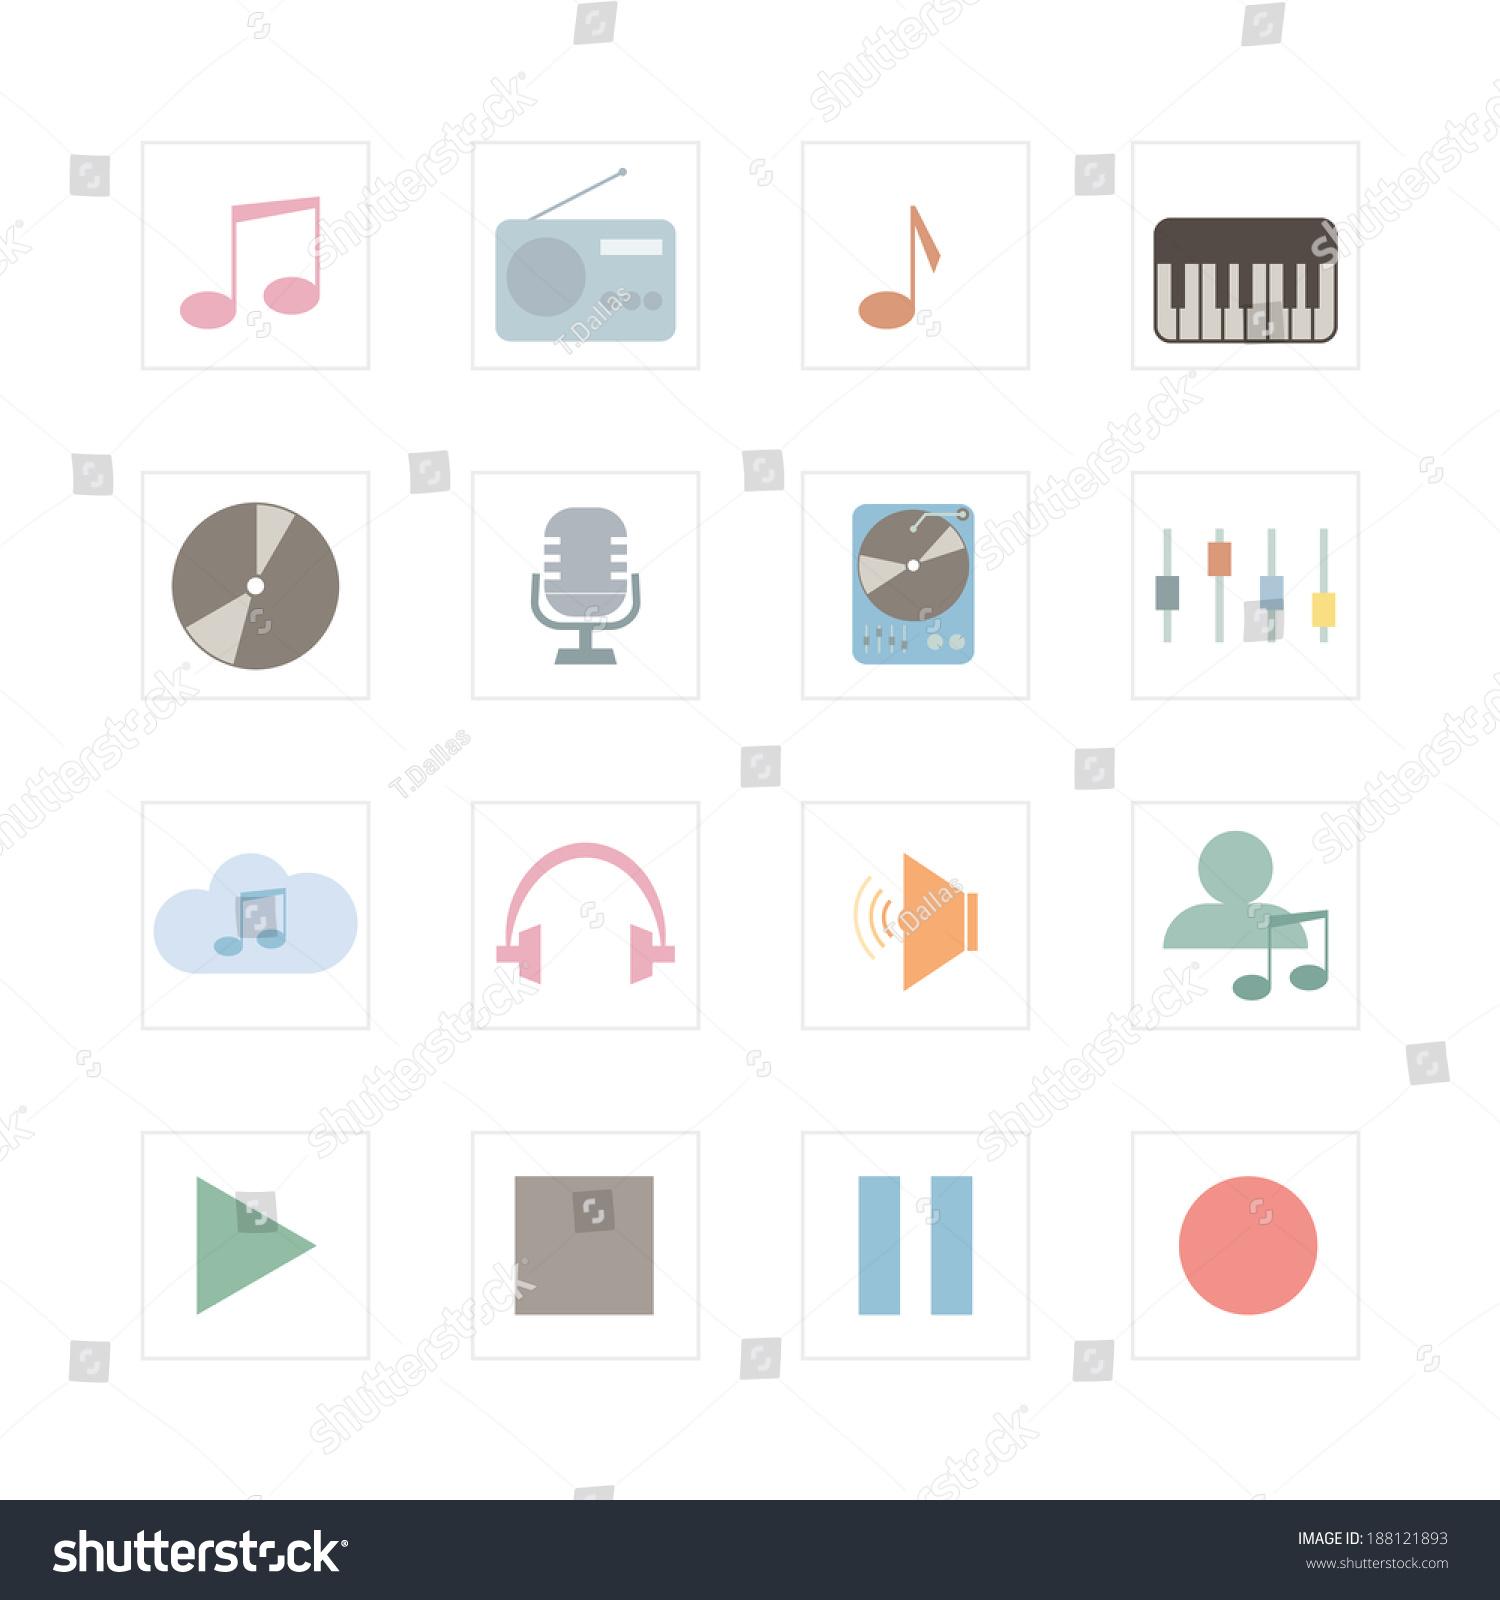 music icon set designed illustration infographics stock vector, Presentation templates